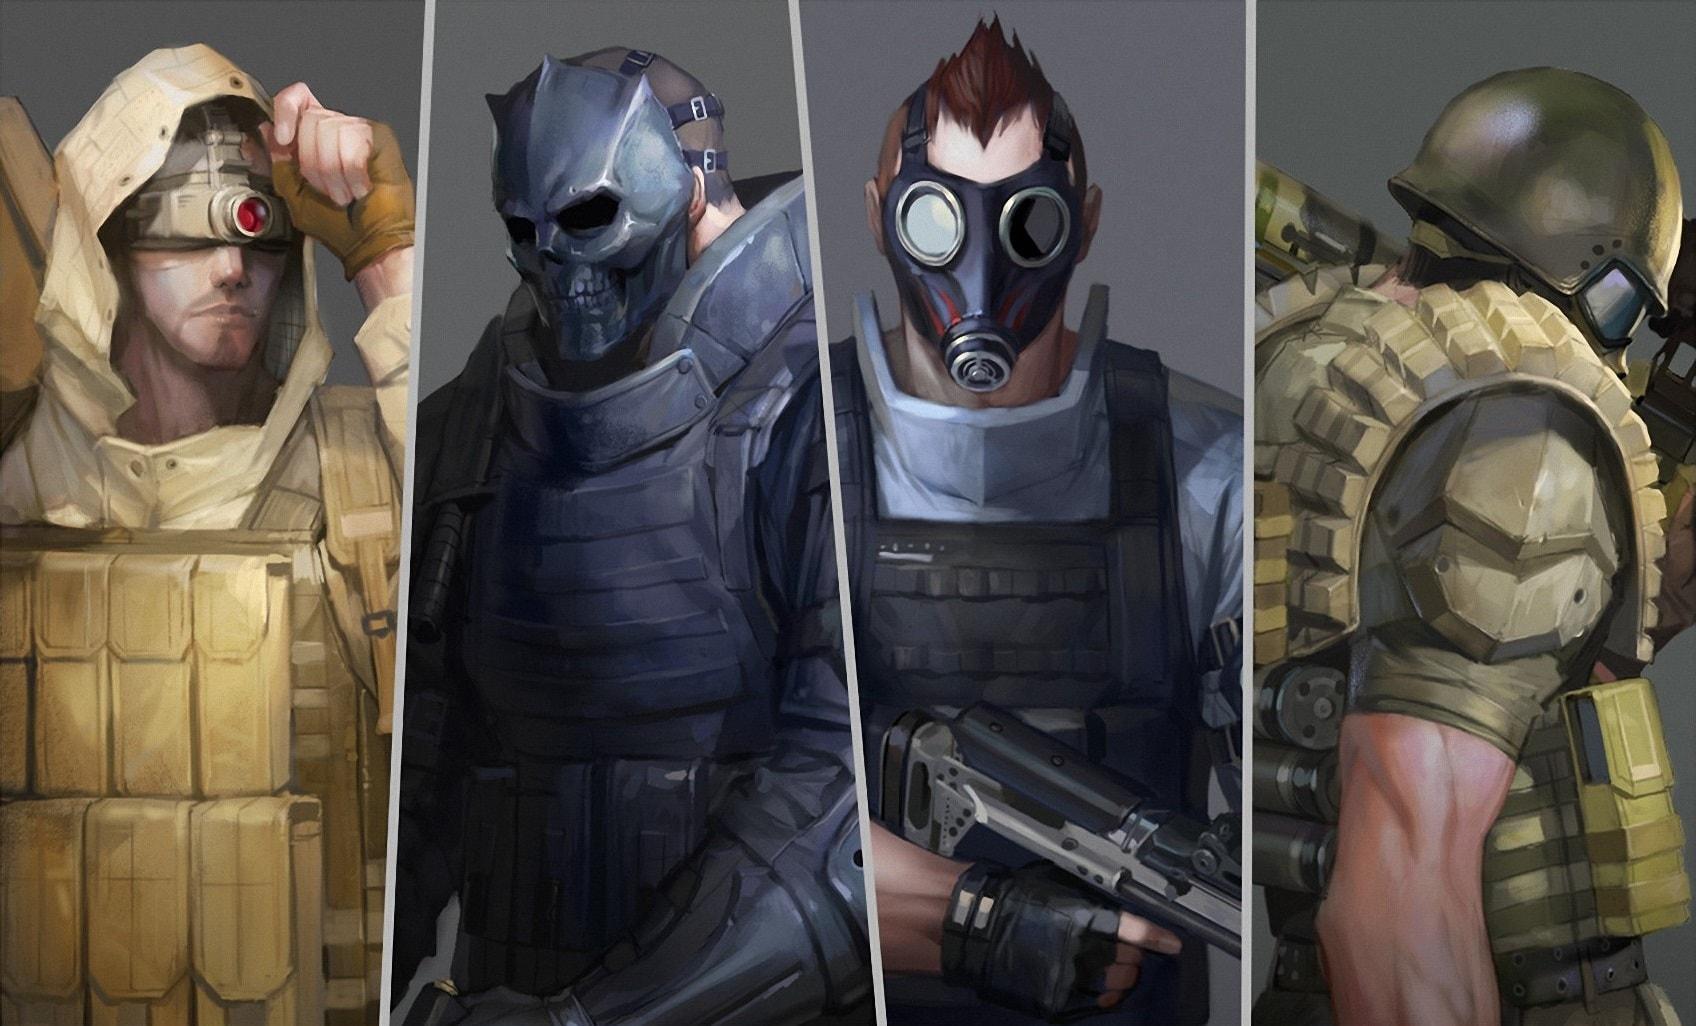 Counter-Strike Online desktop wallpaper